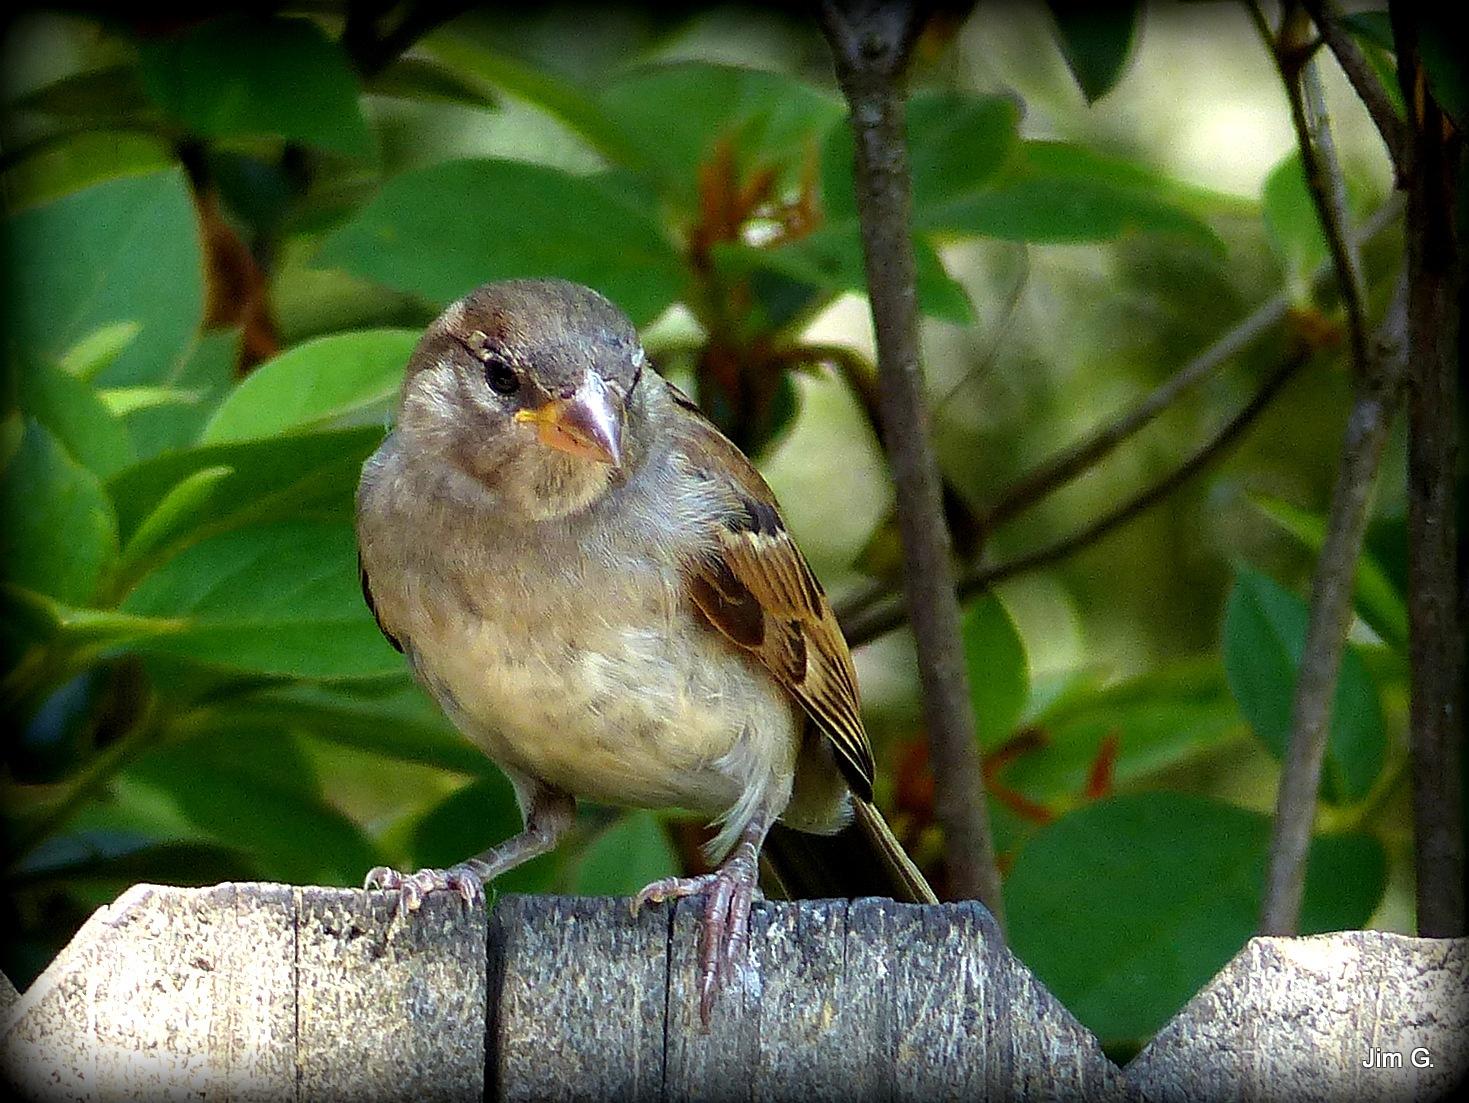 Female Sparrow by Jim Graham